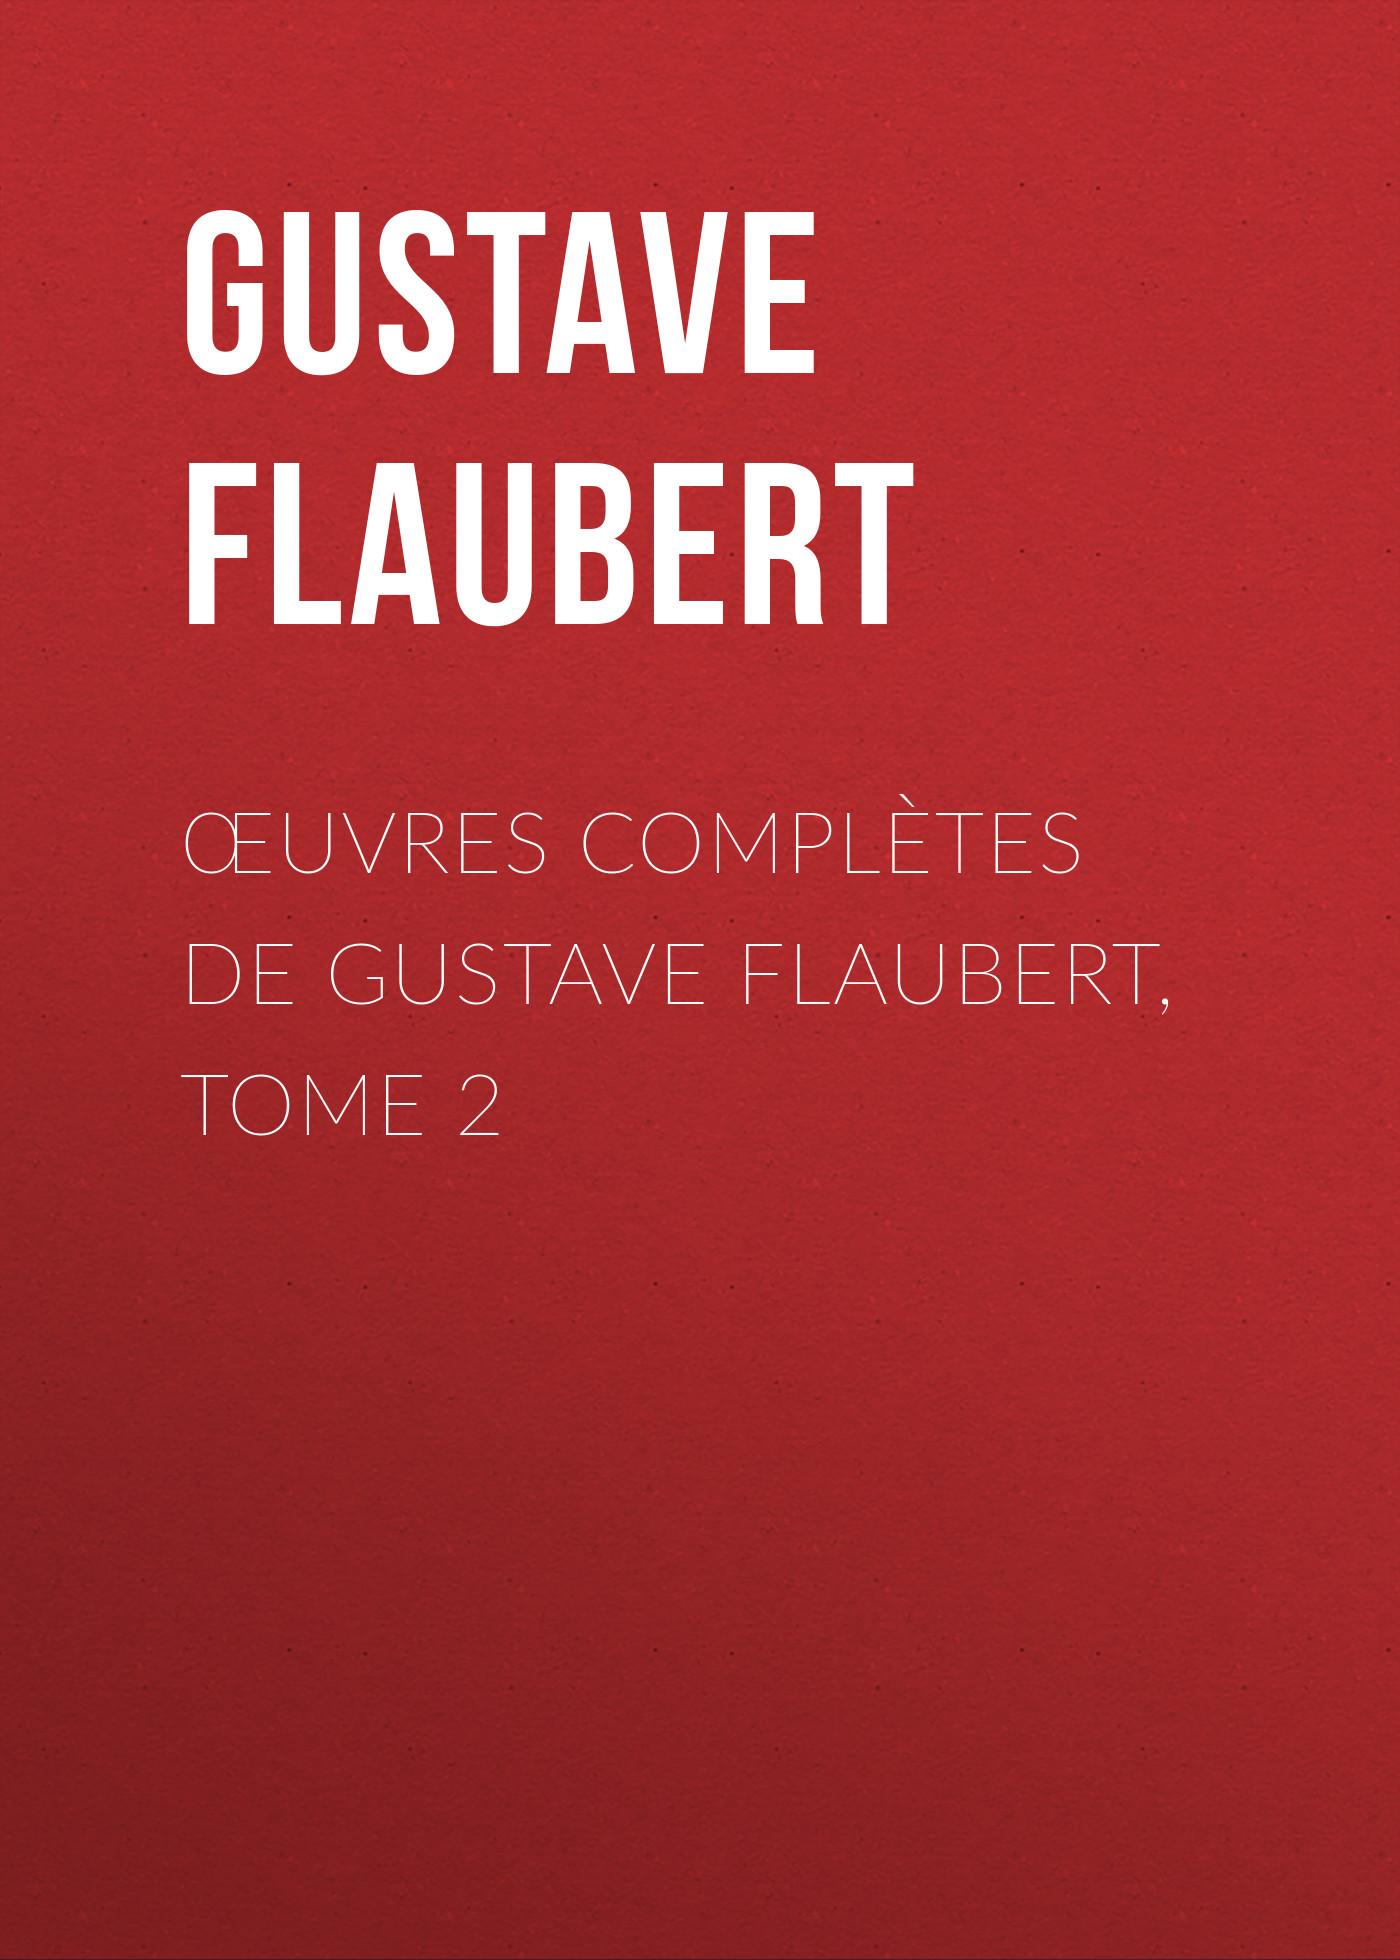 Gustave Flaubert Œuvres complètes de Gustave Flaubert, tome 2